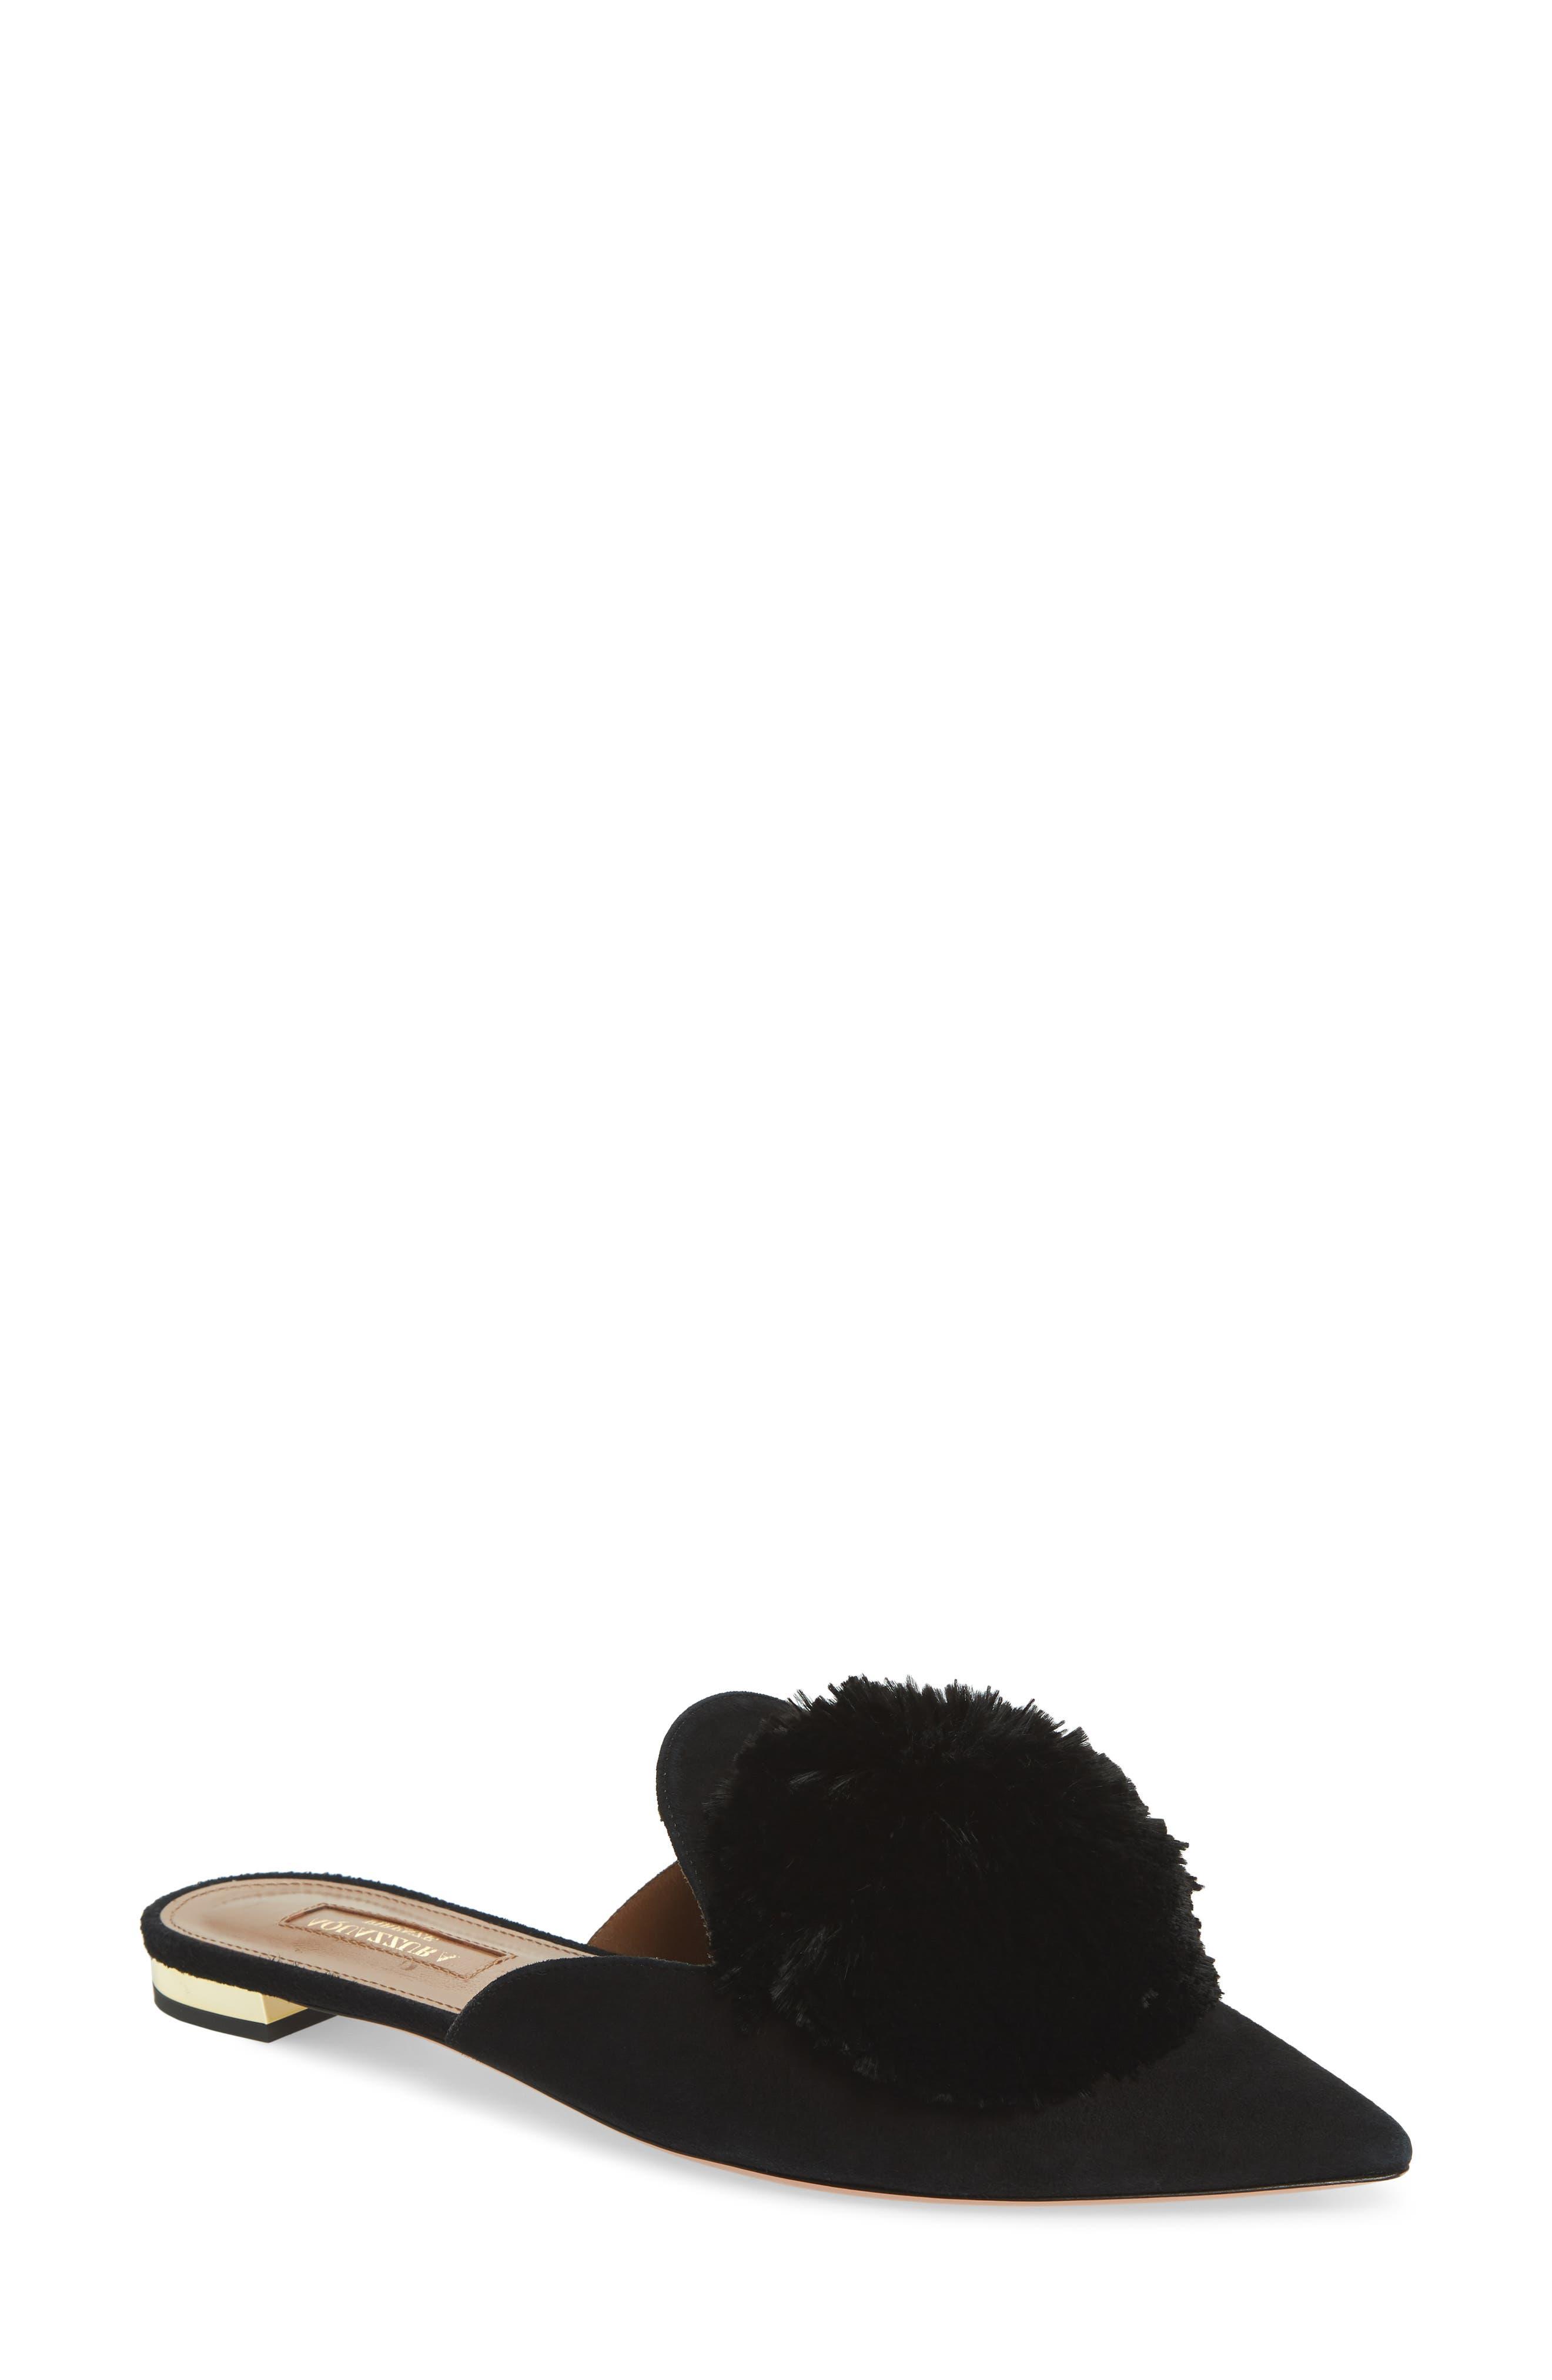 Powder Puff Mule,                             Main thumbnail 1, color,                             BLACK